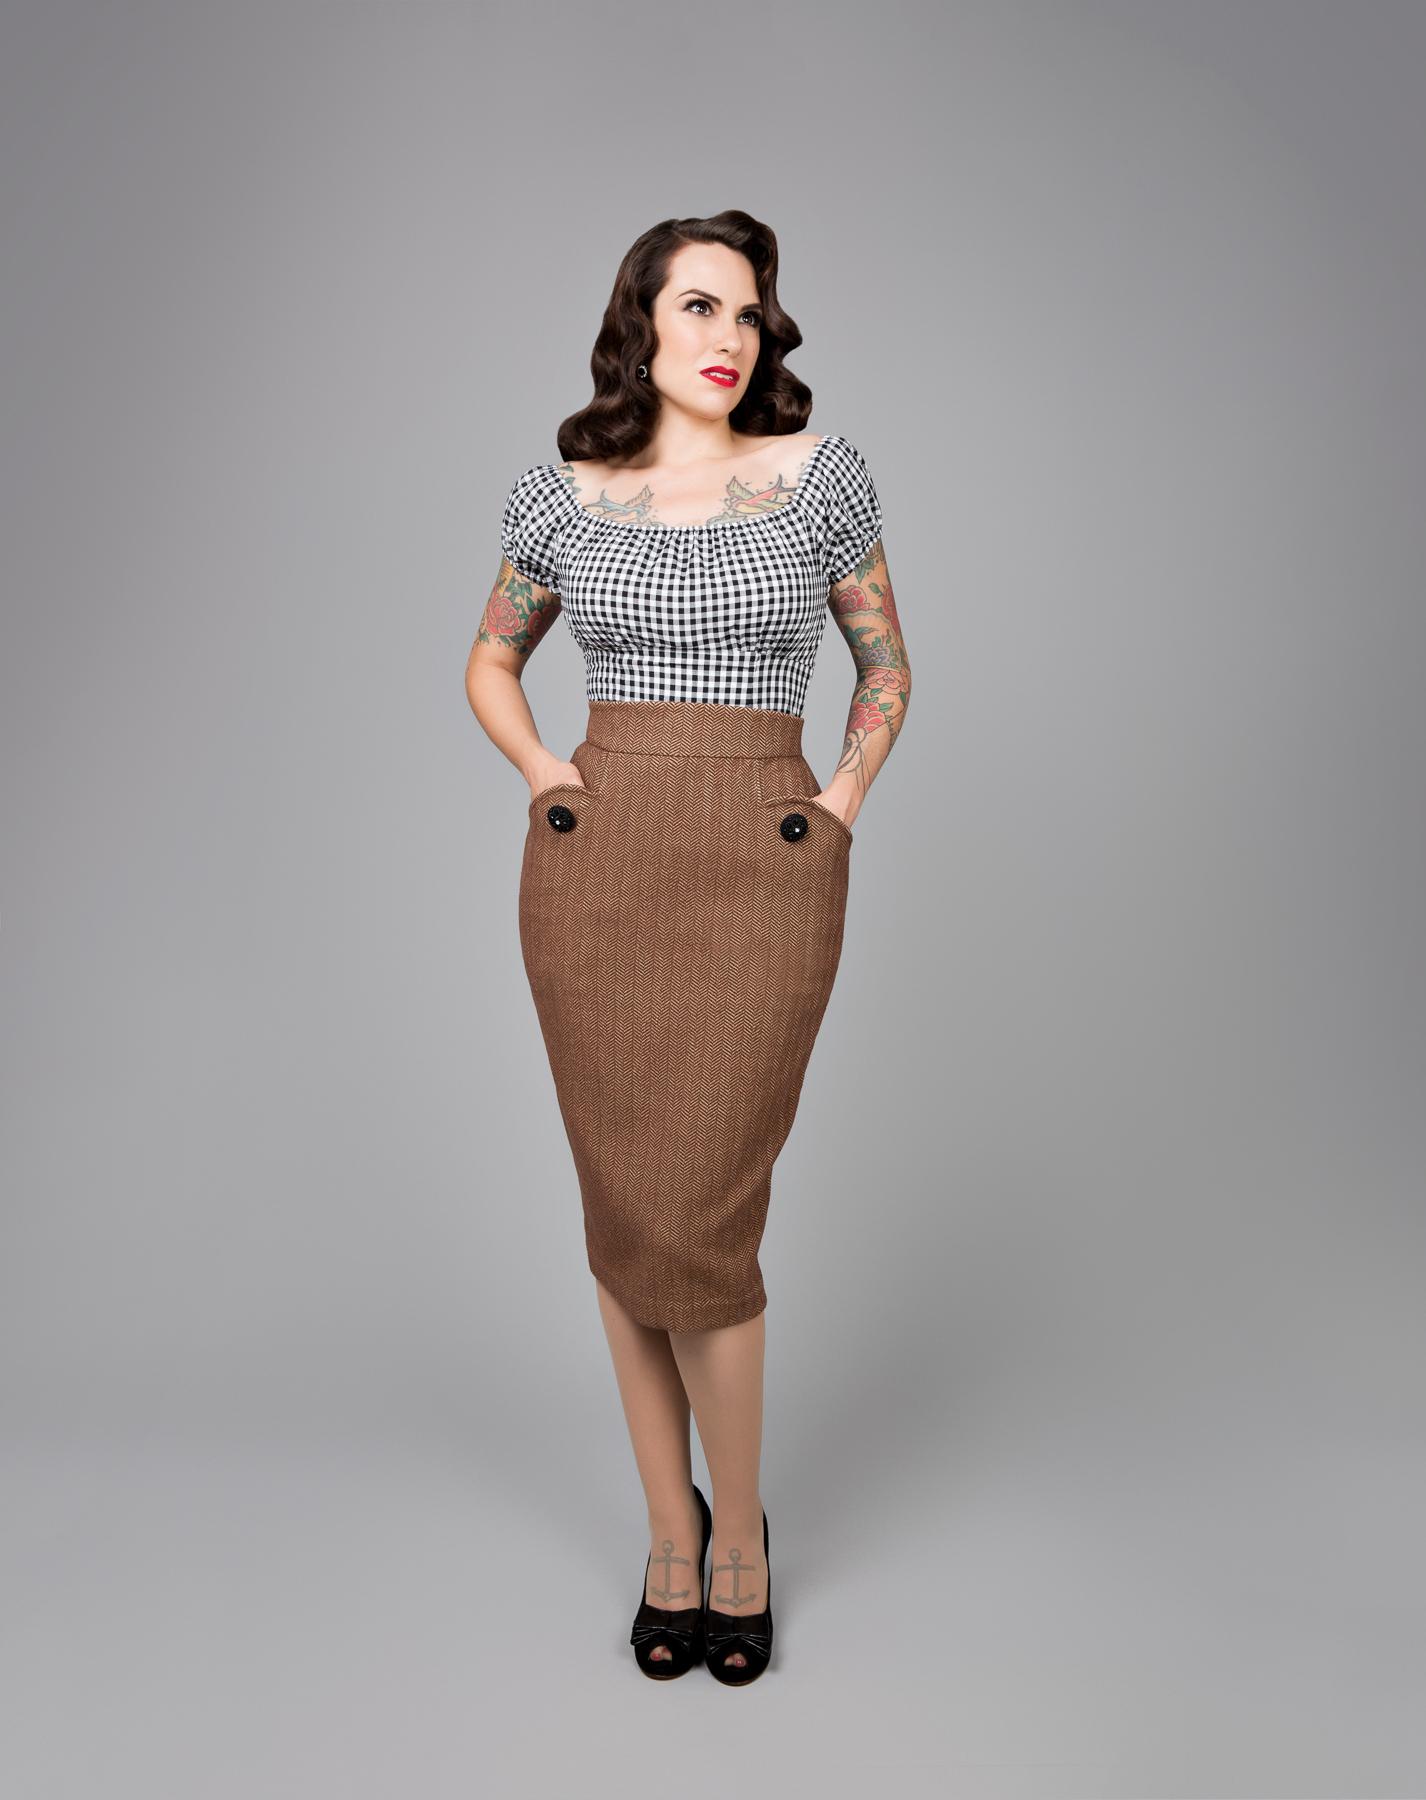 stanwyck skirt charm patterns